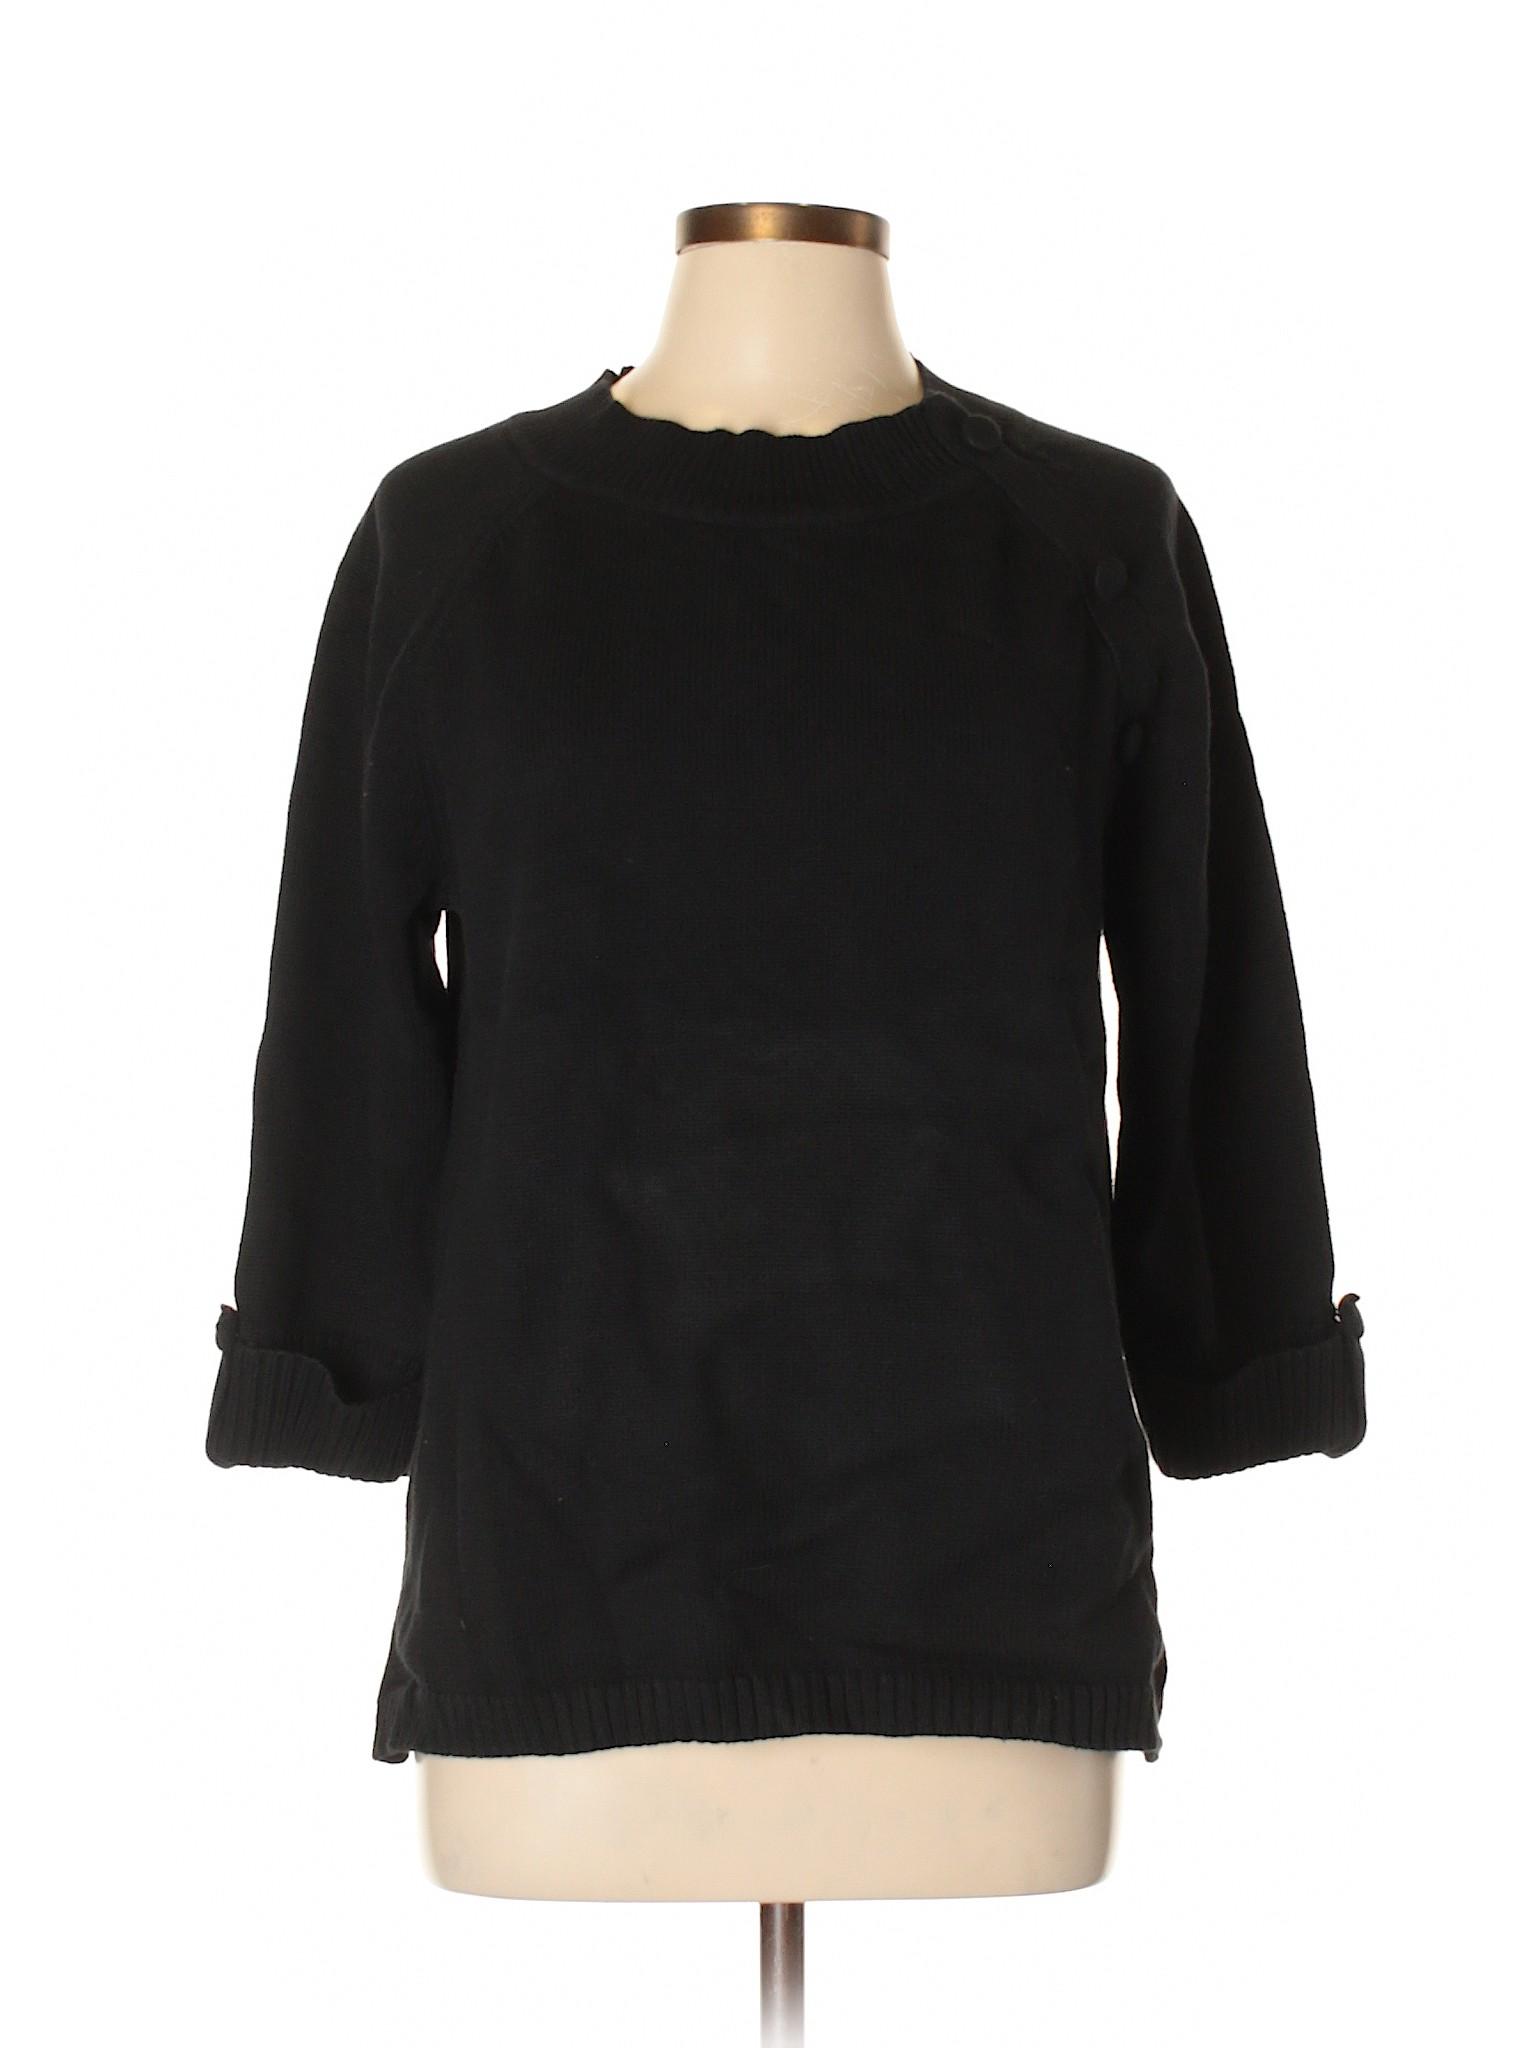 Pullover Pullover Karen Scott Boutique Karen Boutique Sweater Scott gRqFB